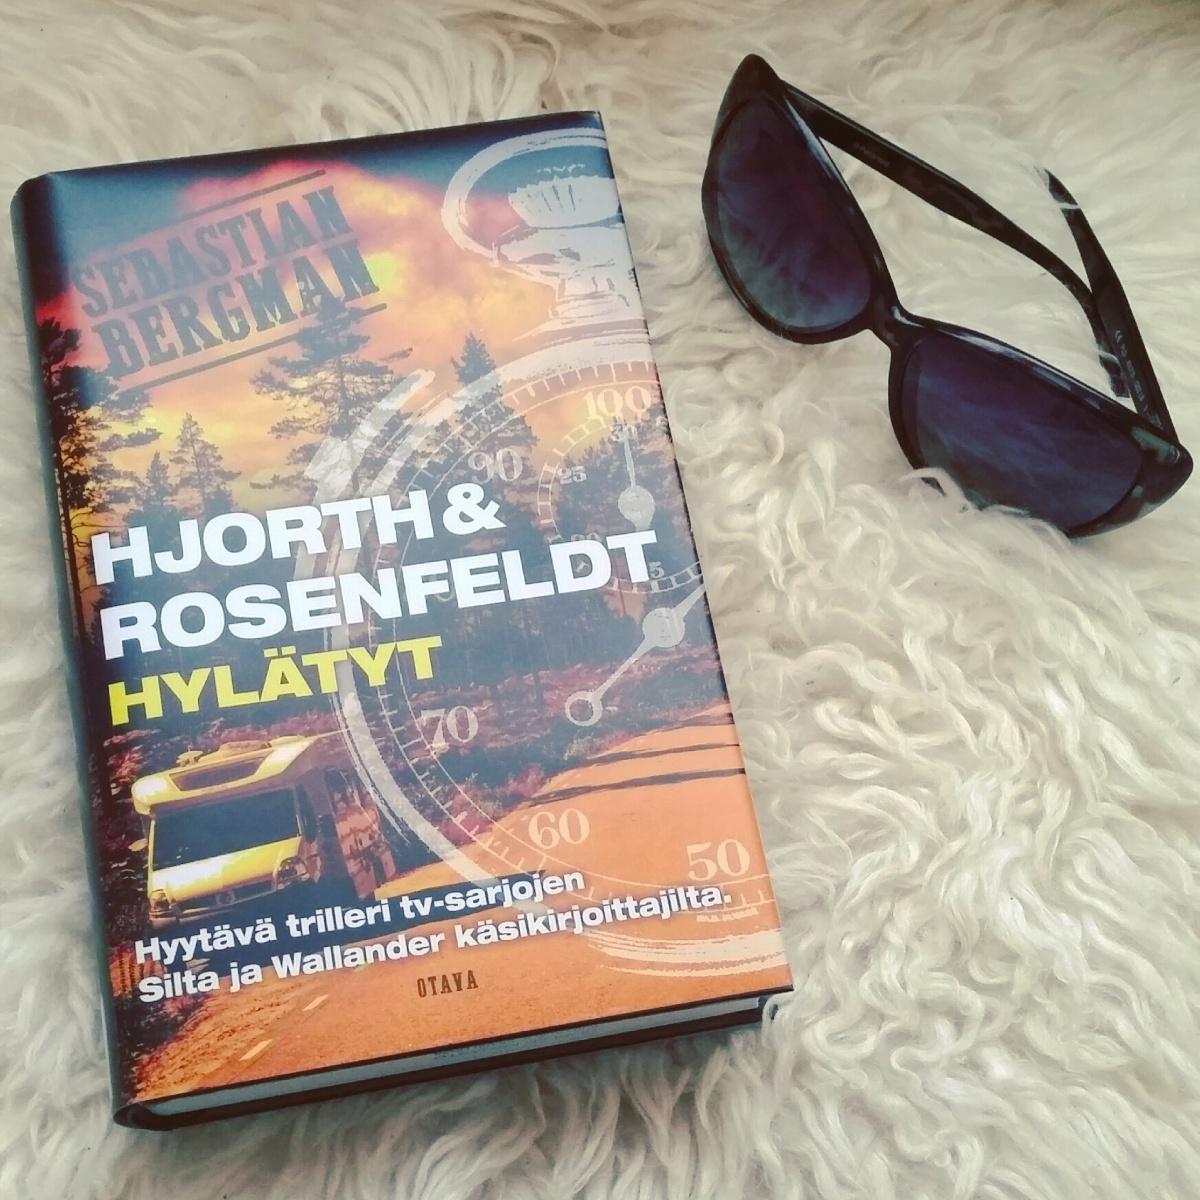 Hjorth & Rosenfeldt: Hylätyt